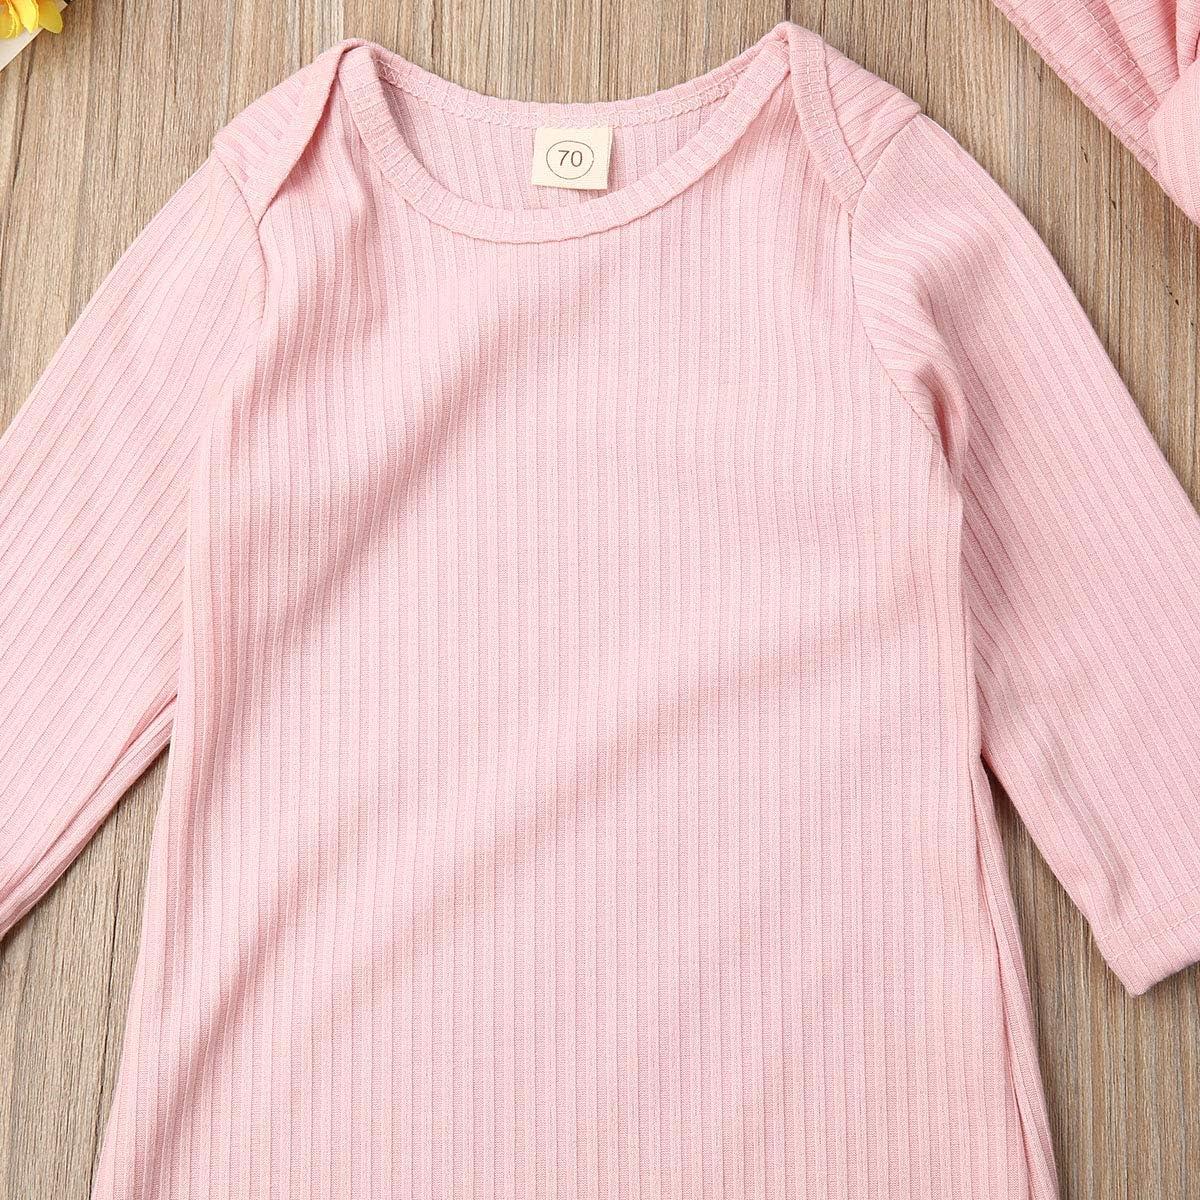 Newborn Baby Boy Girl Sleeper Gown Long Sleeve Floral Infant Sleepwear Romper Nightgowns Pajamas Set